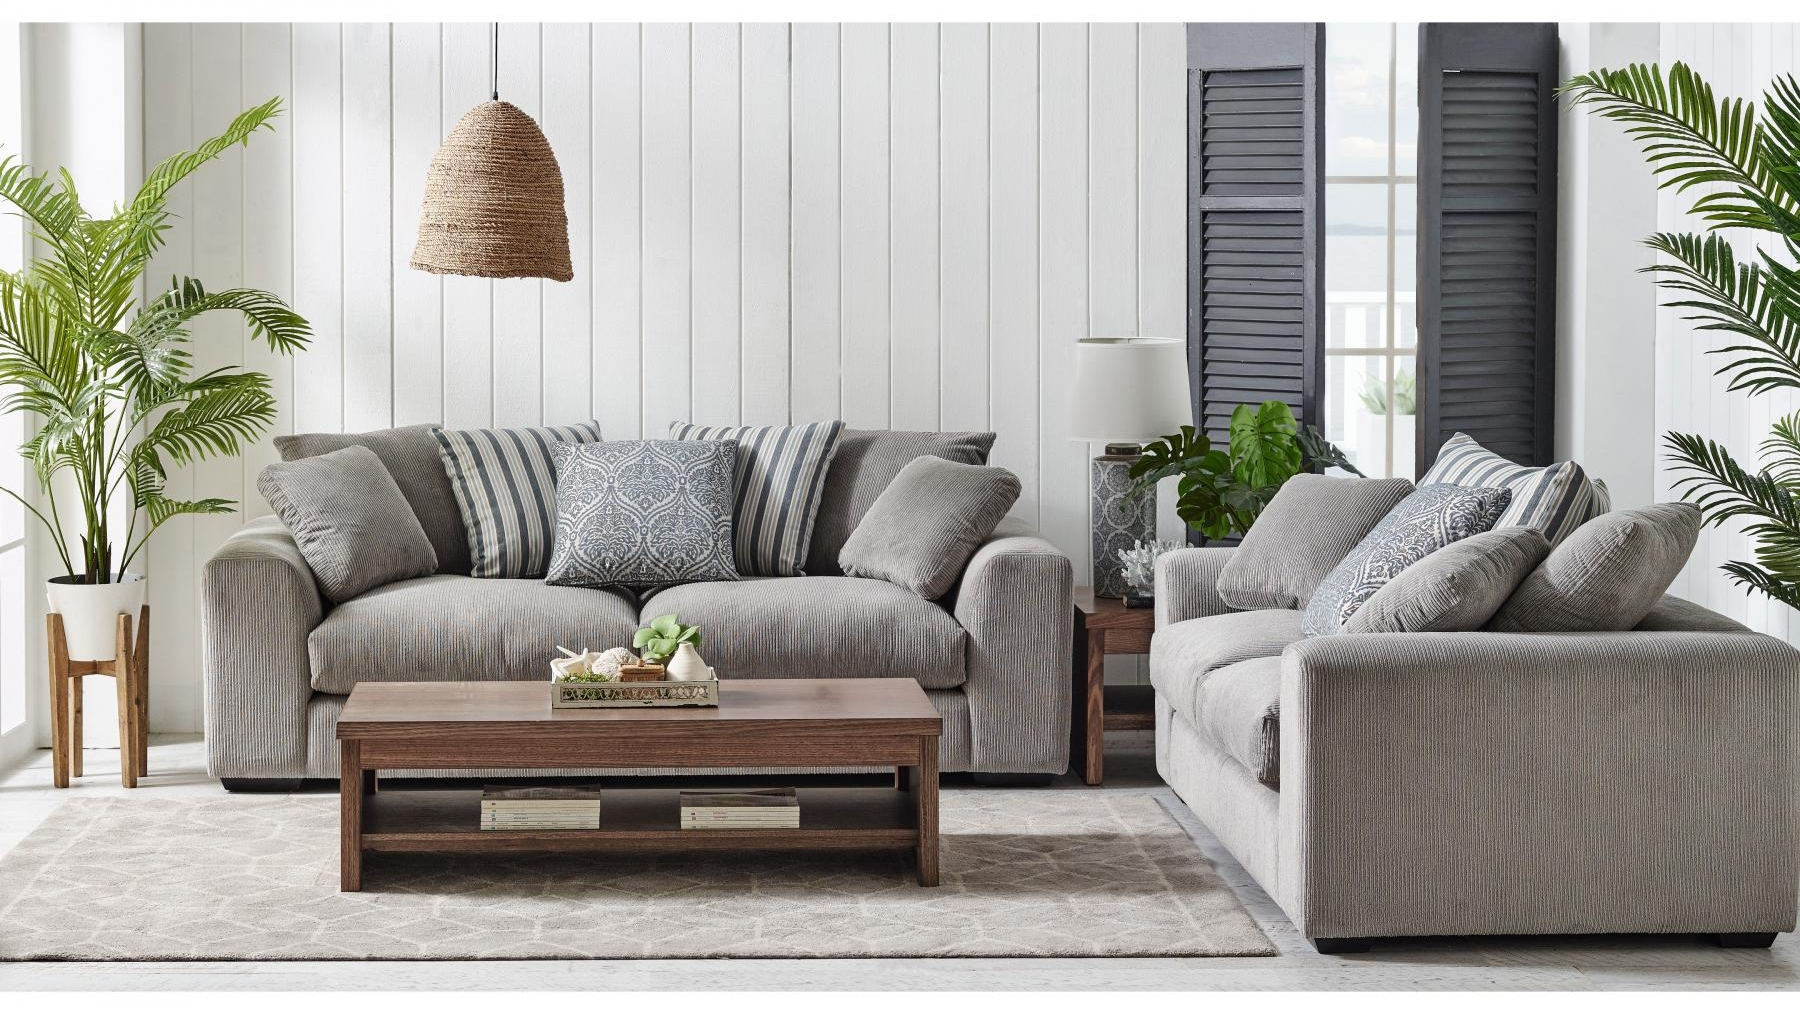 Unique Designer Lounges In Sydney That Can Transform Your Spaces!